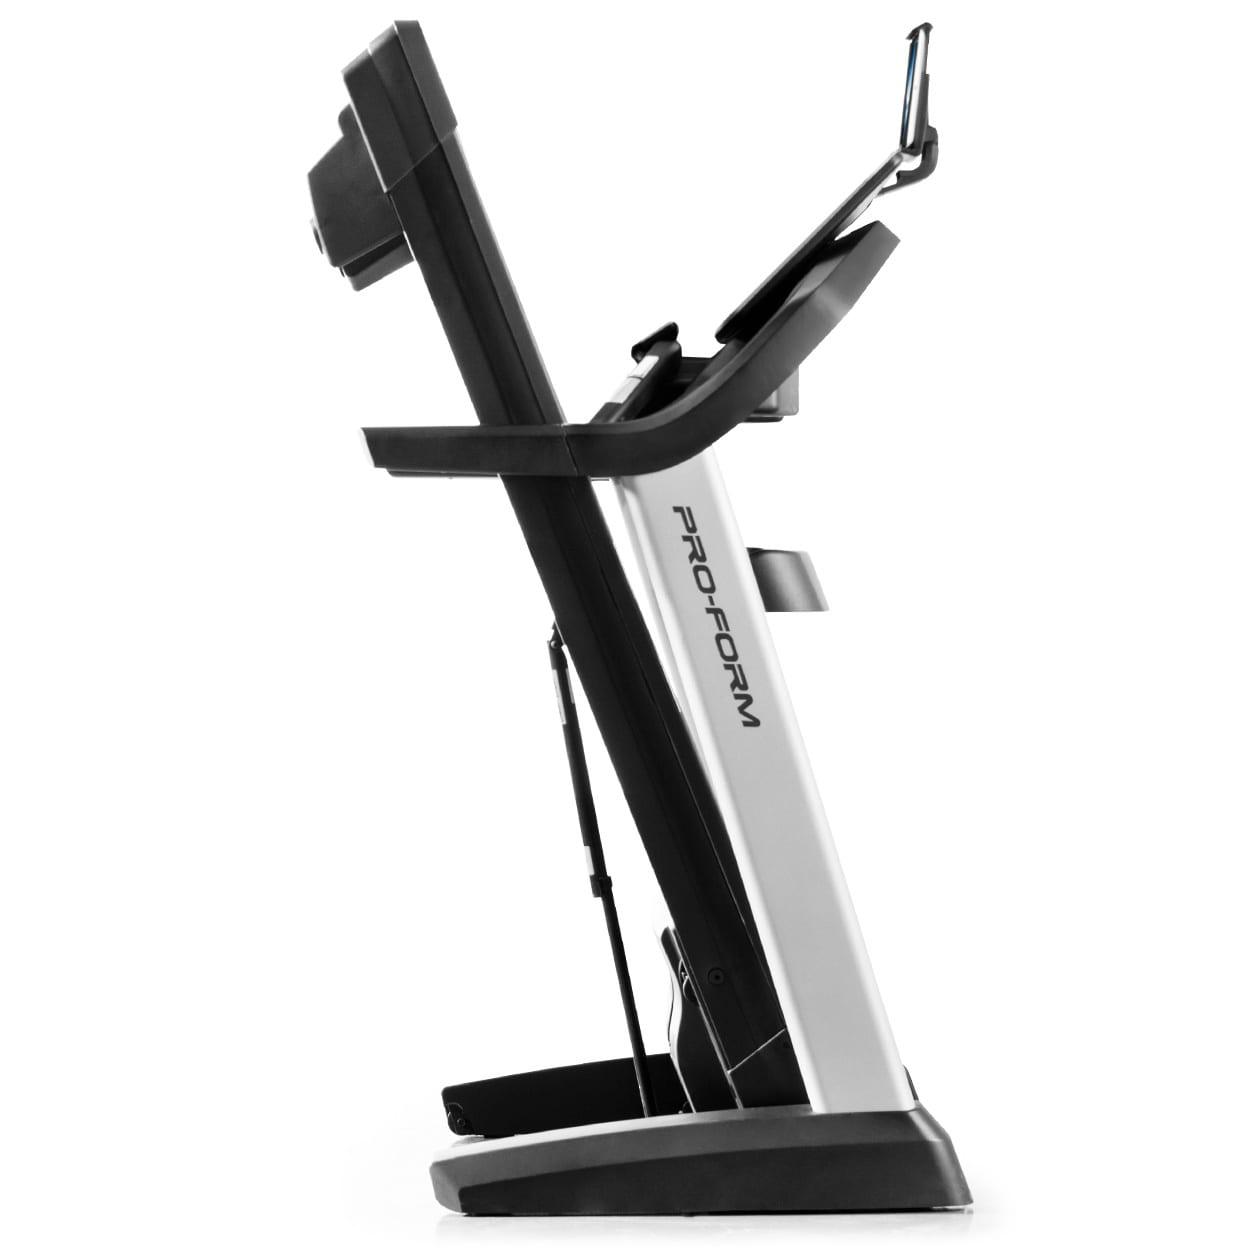 Workout Warehouse Treadmills ProForm Pro 9000  gallery image 5